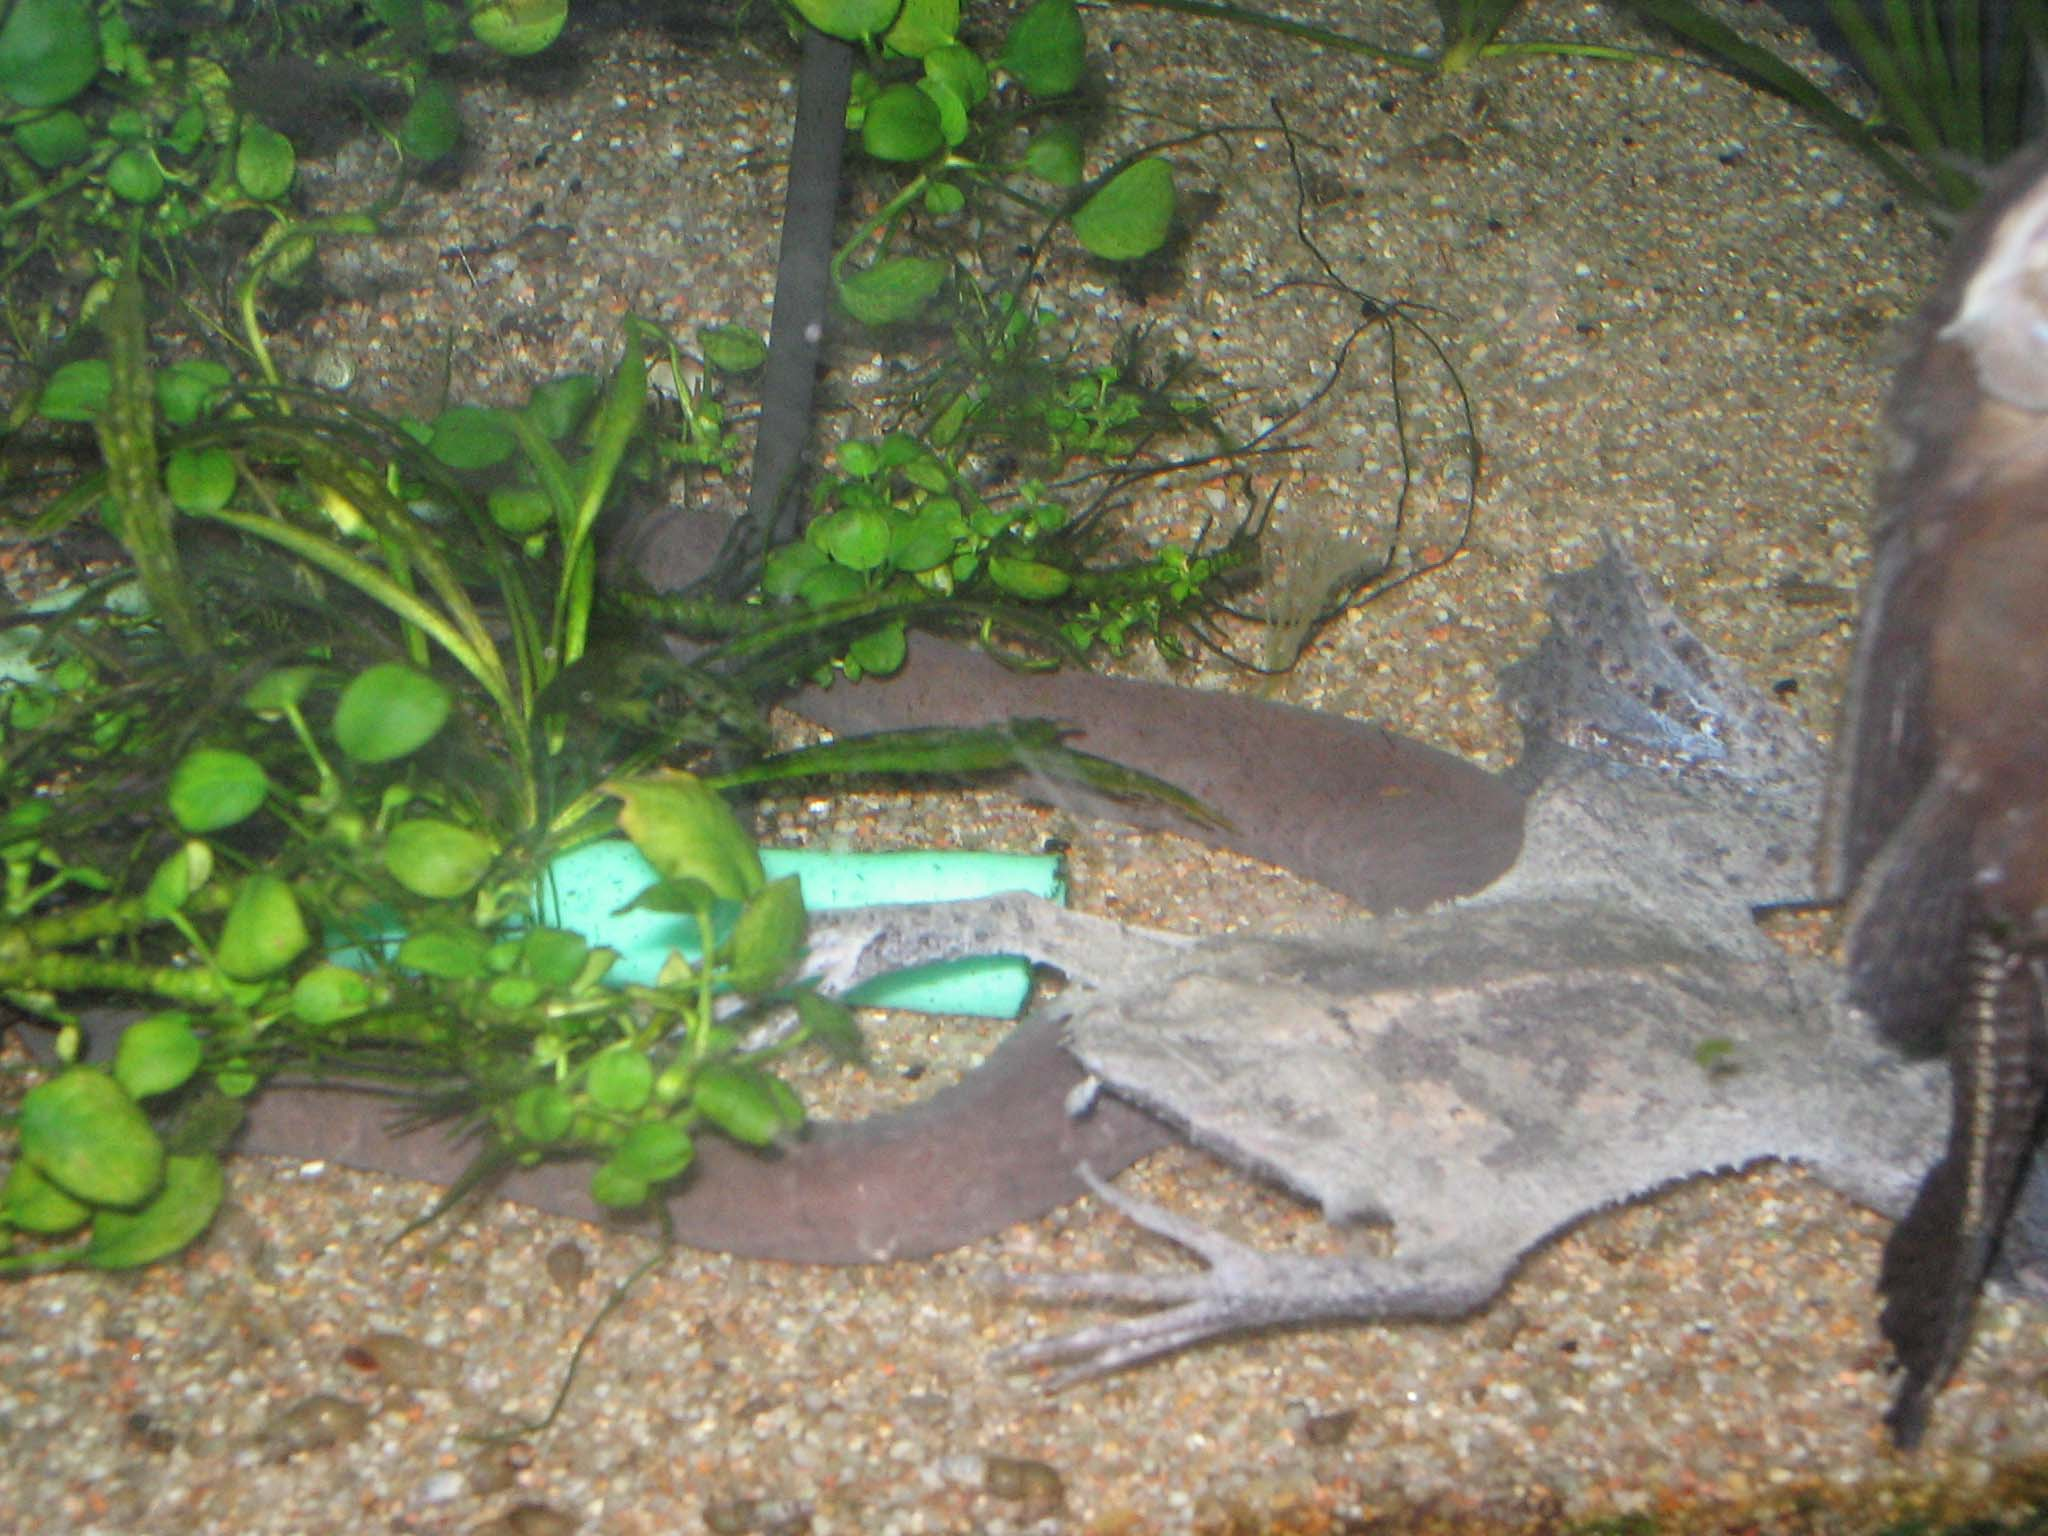 Rubber Eel : Typhlonectes natans